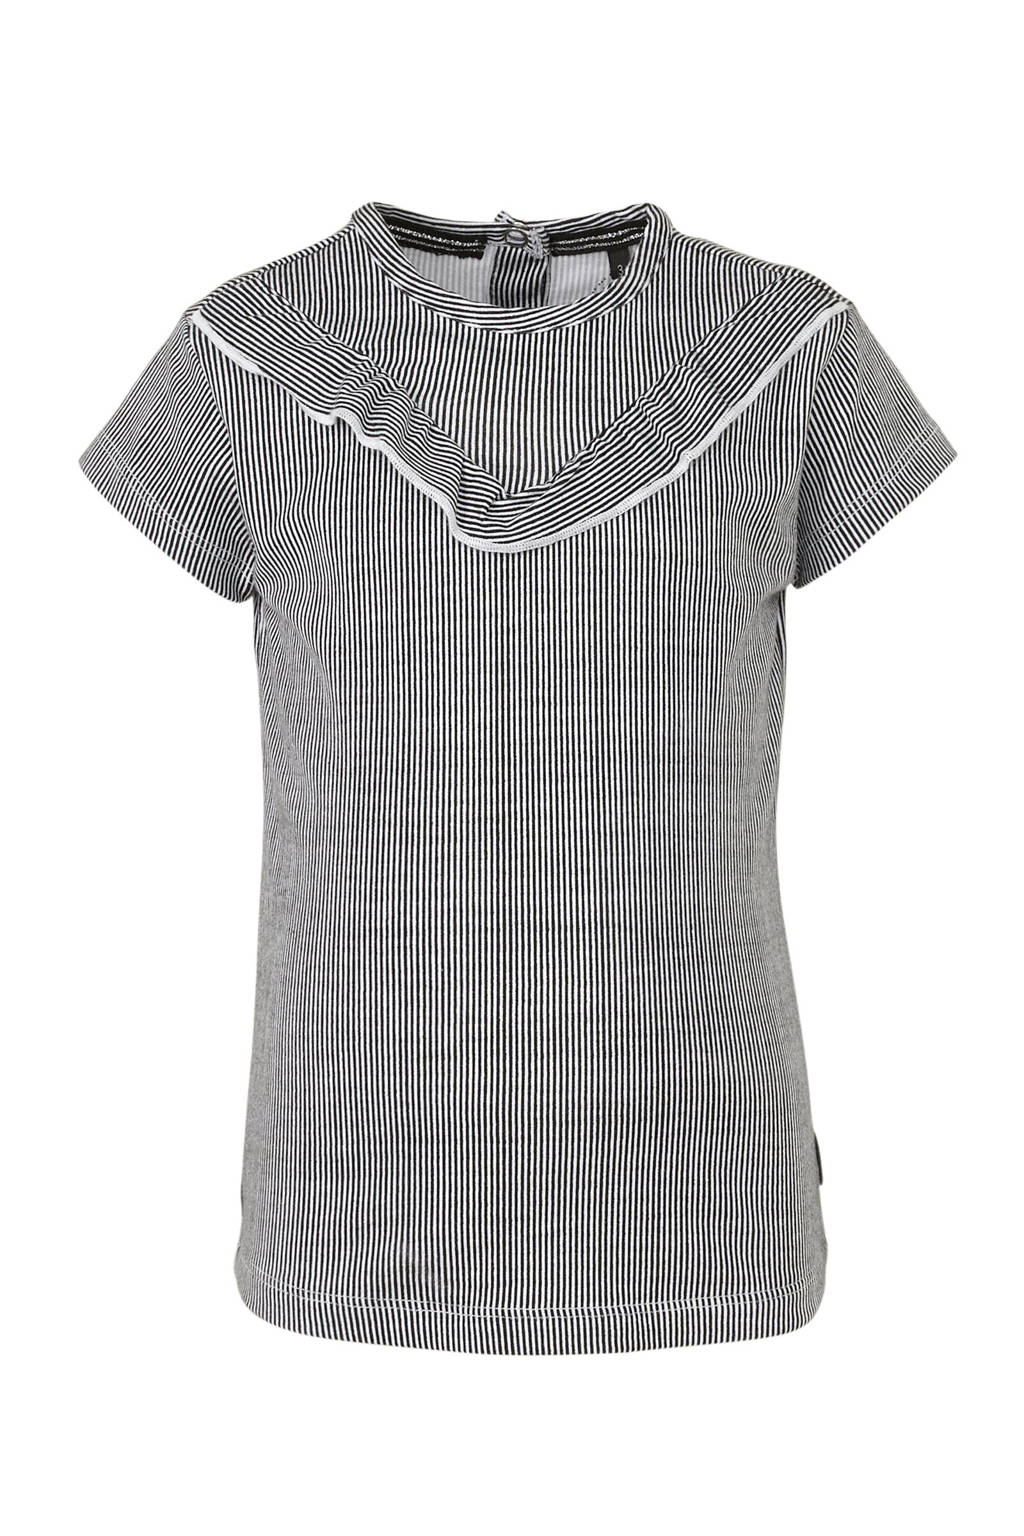 LEVV gestreept T-shirt Gill zwart/wit, Zwart/wit